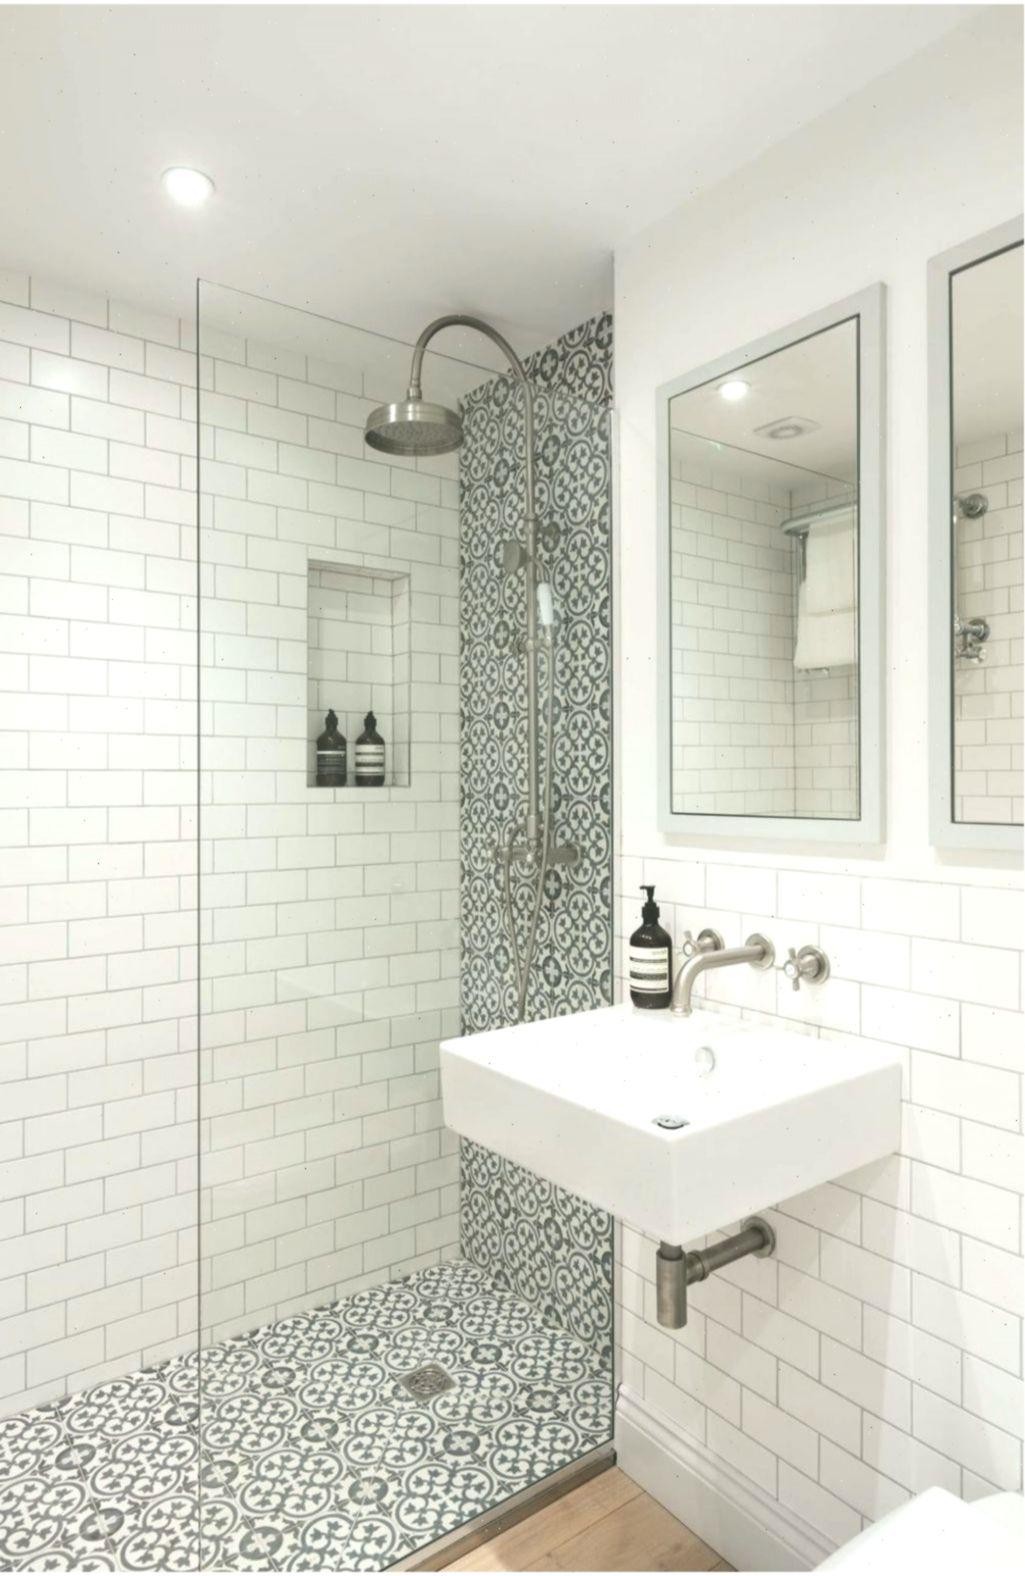 Inspiring Small Bathroom Remodel Ideas Kleinebadideen Verysmallbathroomideas In 2020 Small Bathroom Inspiration Bathroom Remodel Tile Small Bathroom